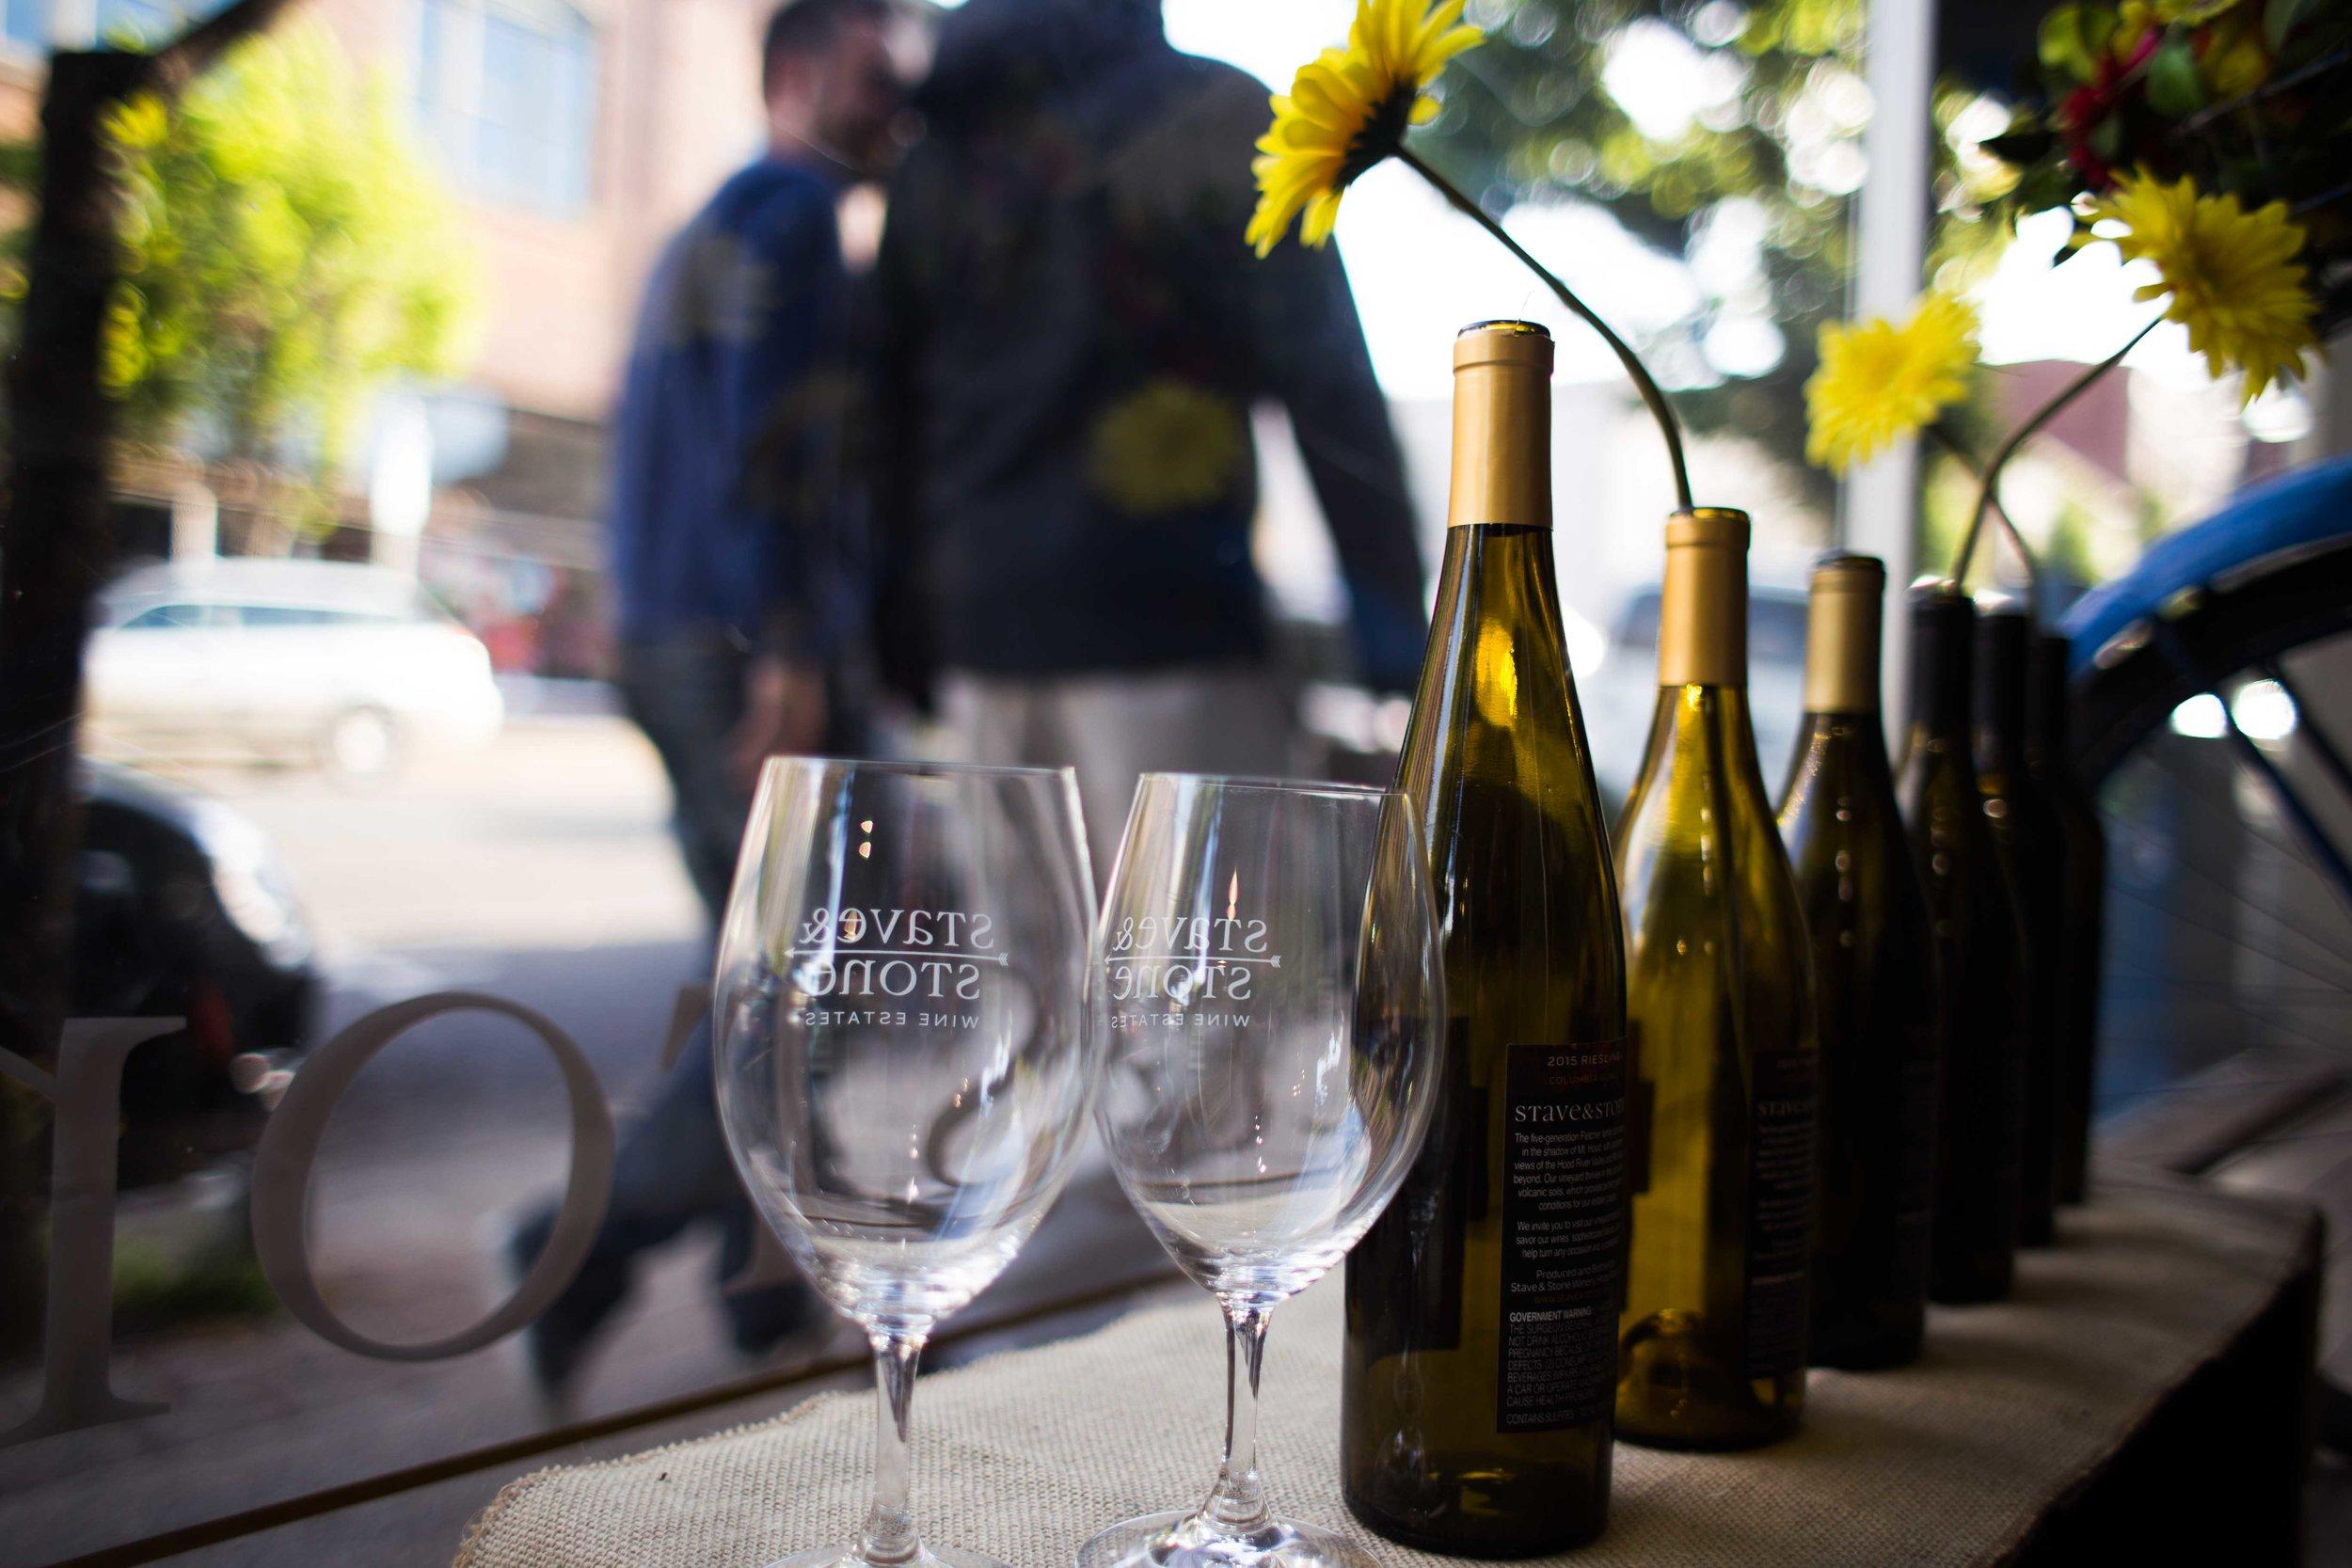 Hood River Wine Alliance Wine Walk Columbia Gorge Downtown Tasting Rooms Wineries Drink Taste Explore Columbia Gorge Oregon Washington-21.jpg